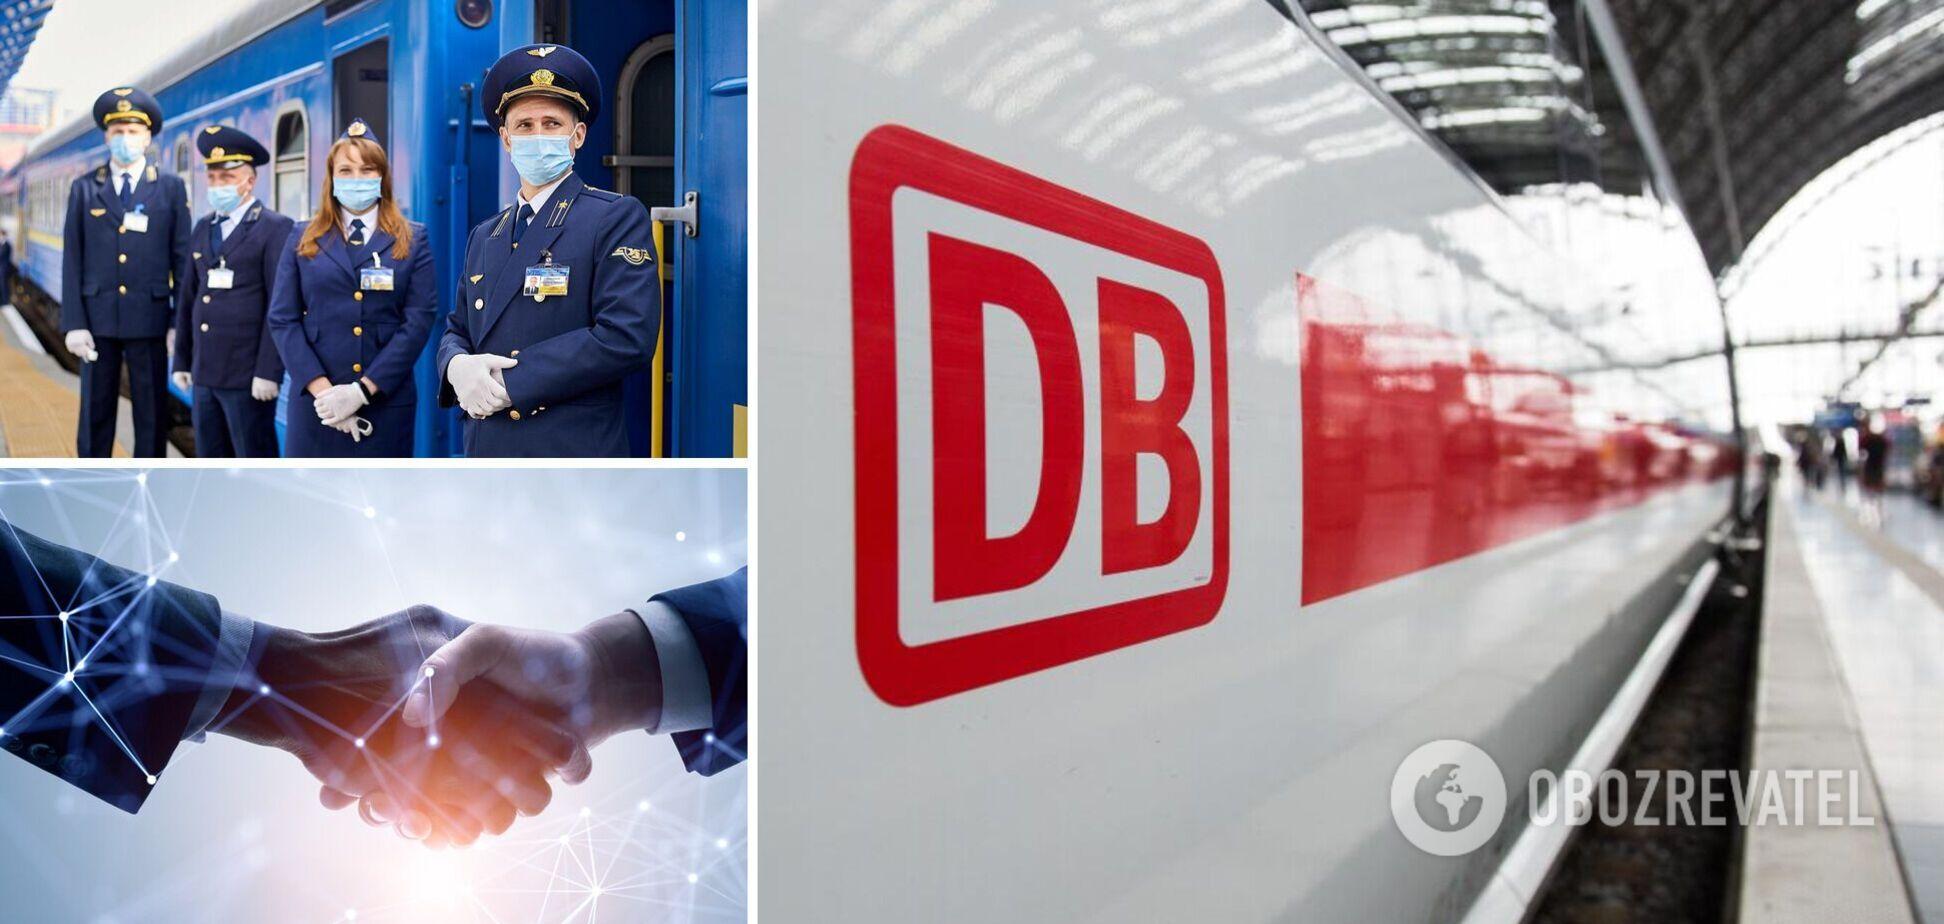 'Укрзалізниця' уклала договір з Deutsche Bahn